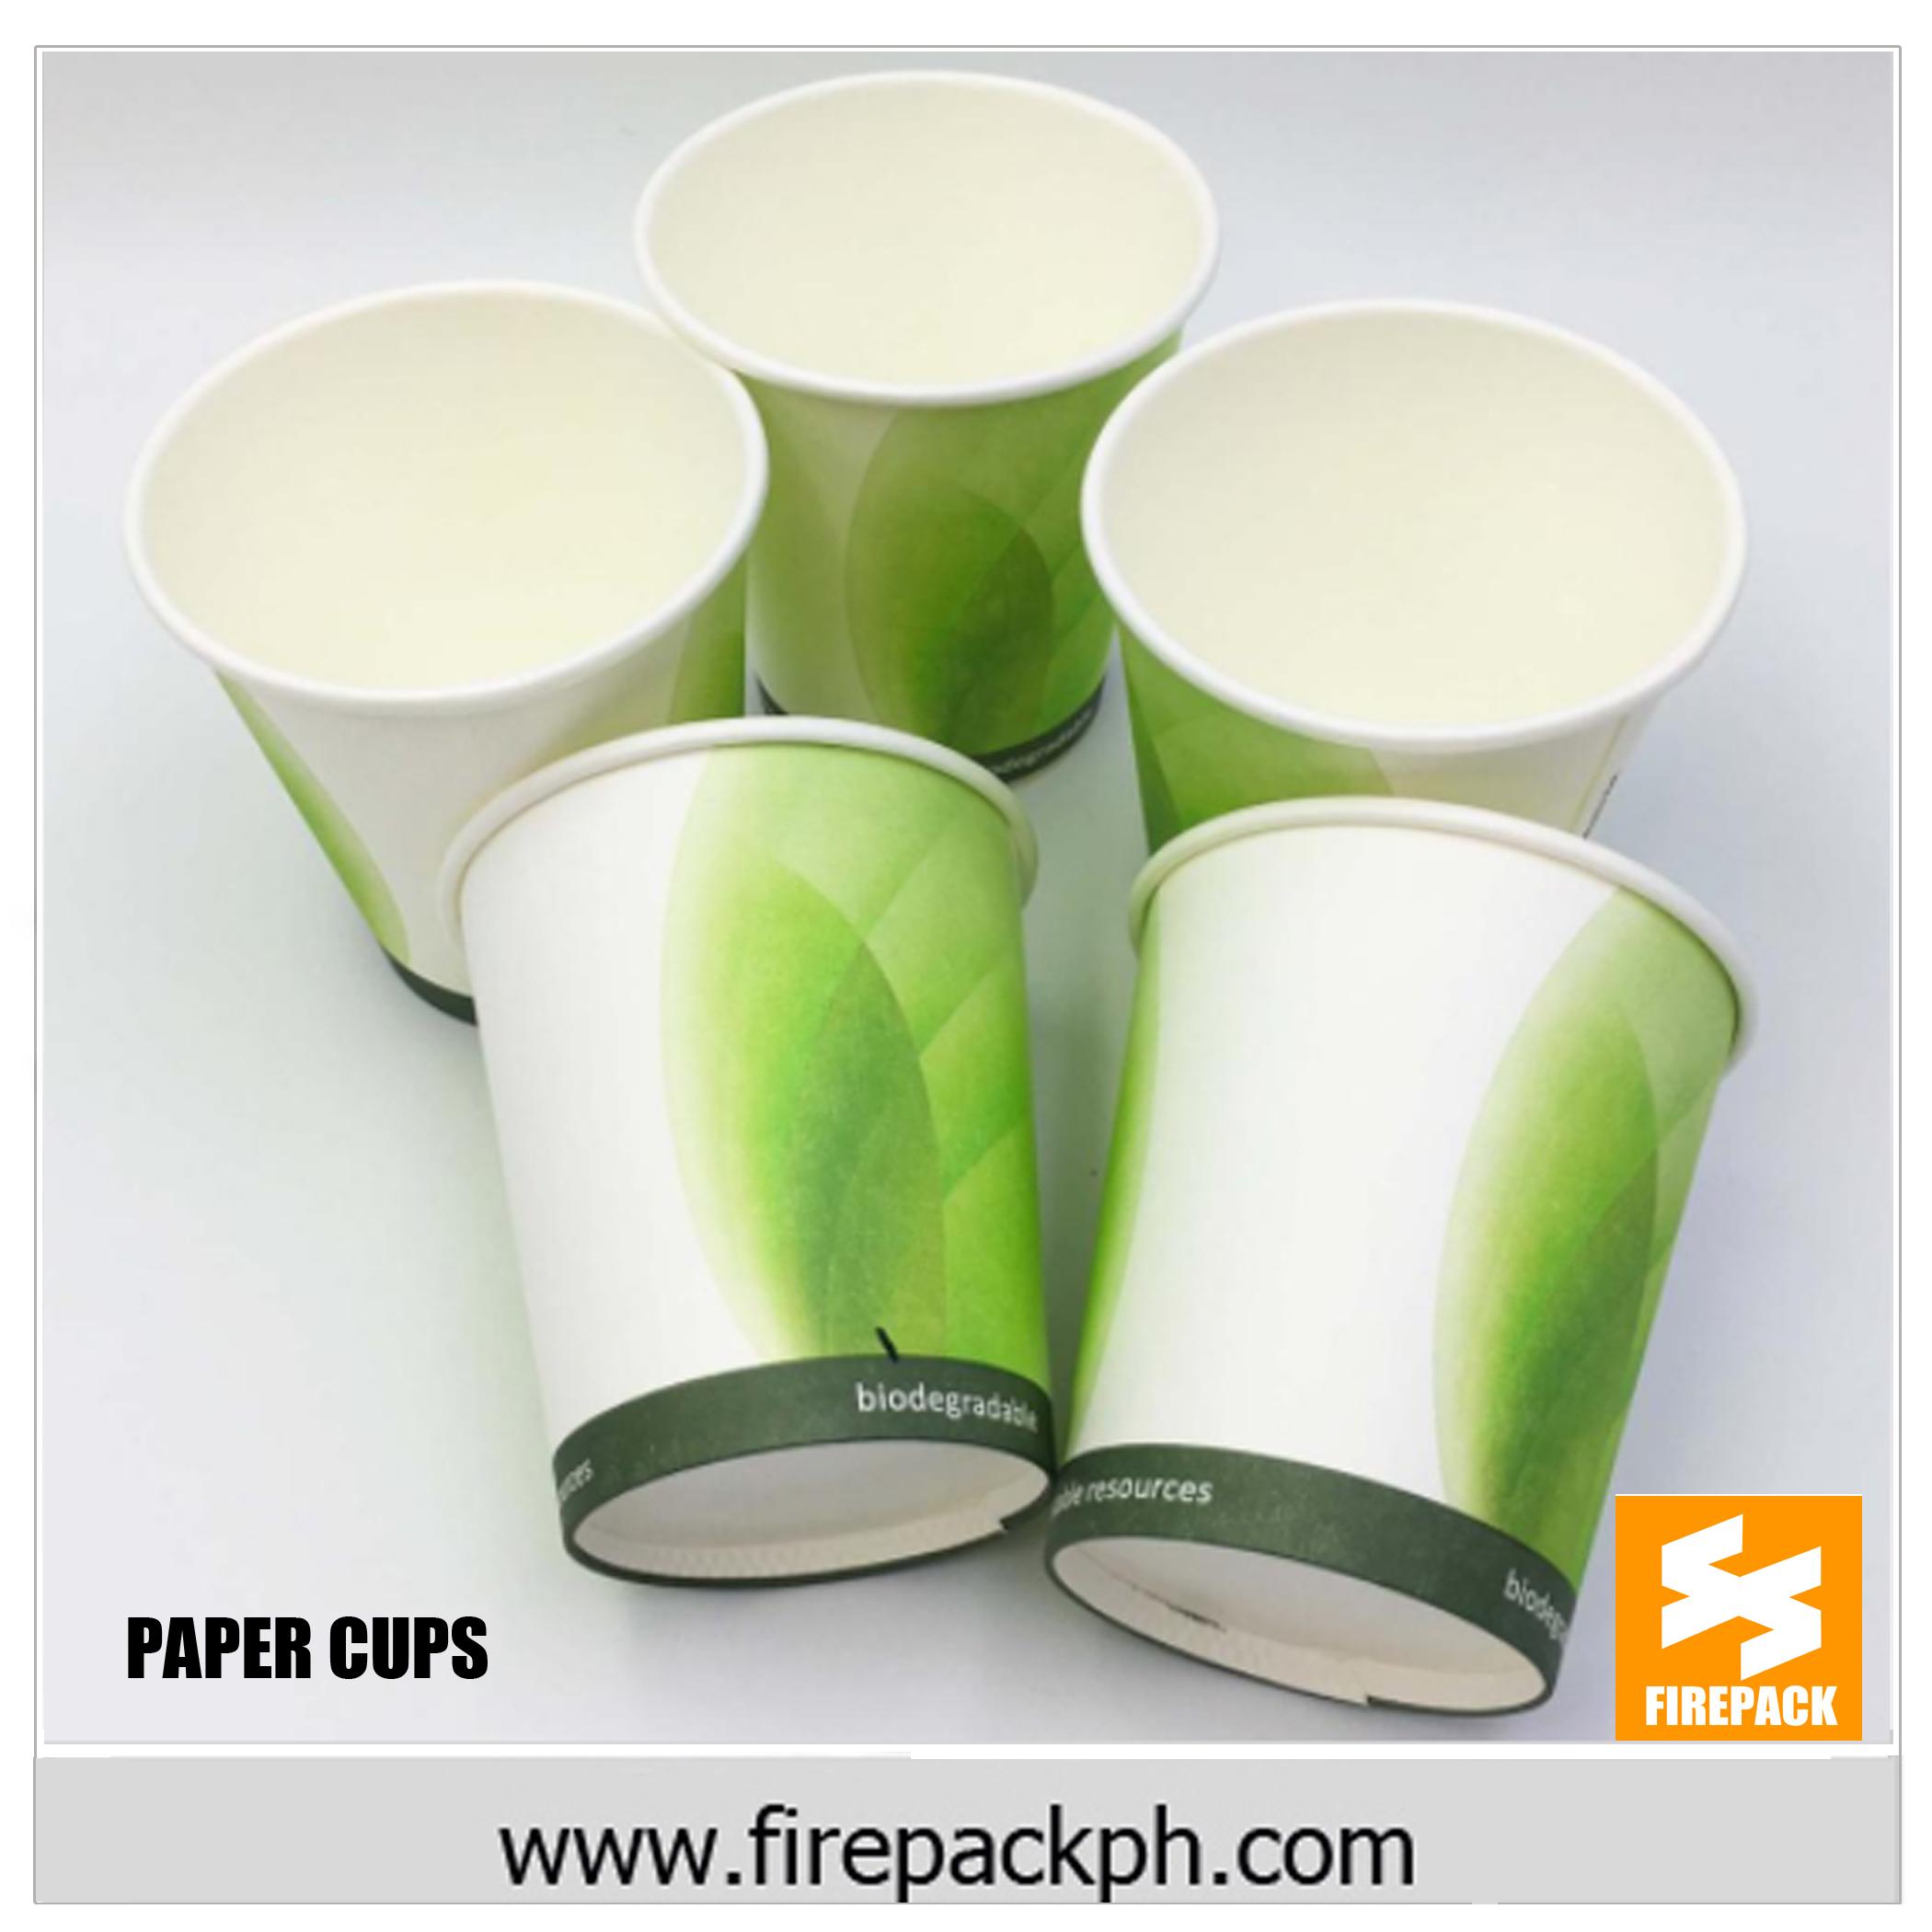 PAPER CUPS – FIREPACK